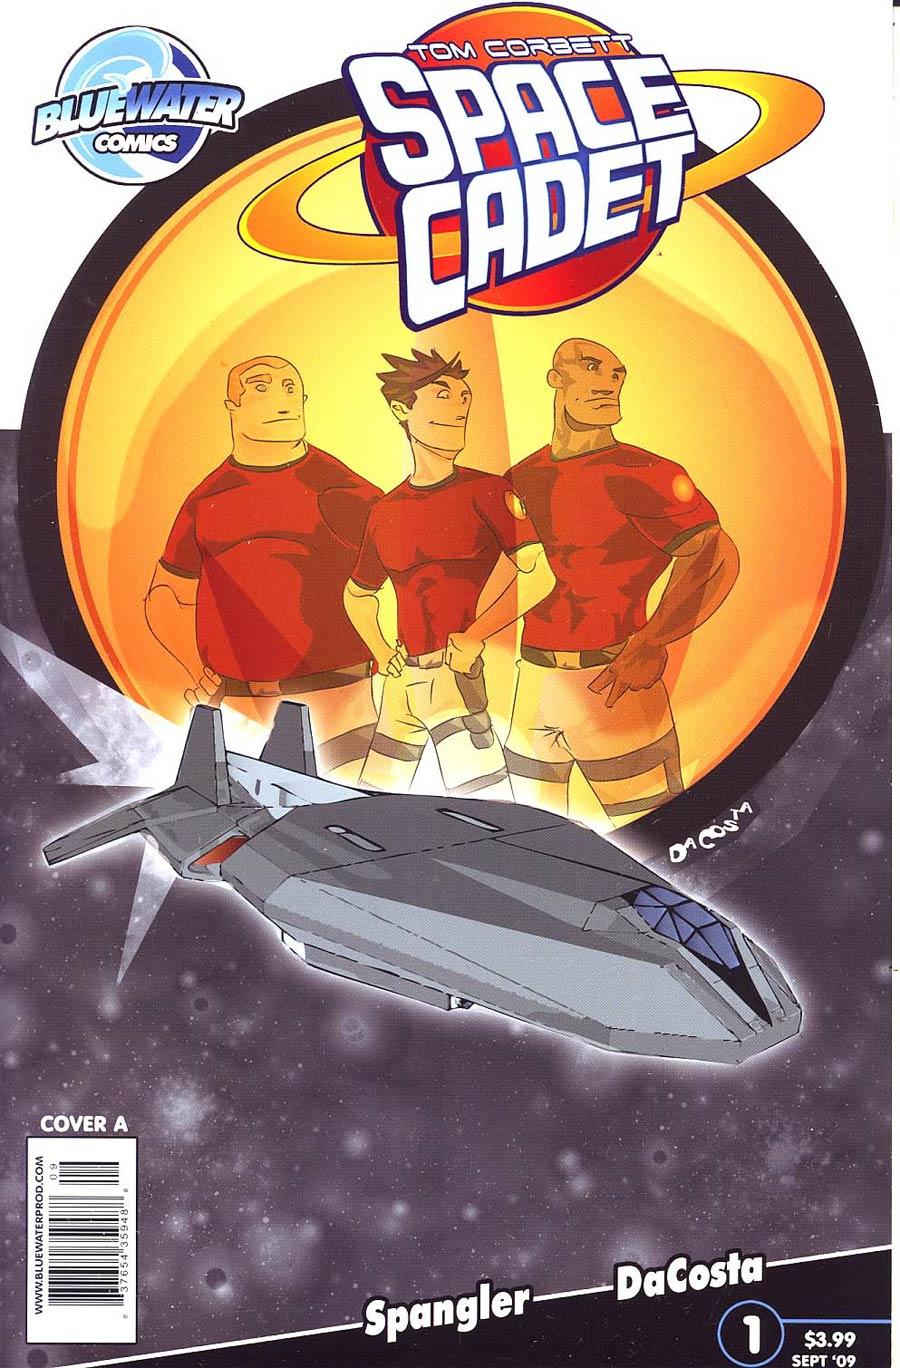 Tom Corbett Space Cadet Vol 3 #1 Cover A